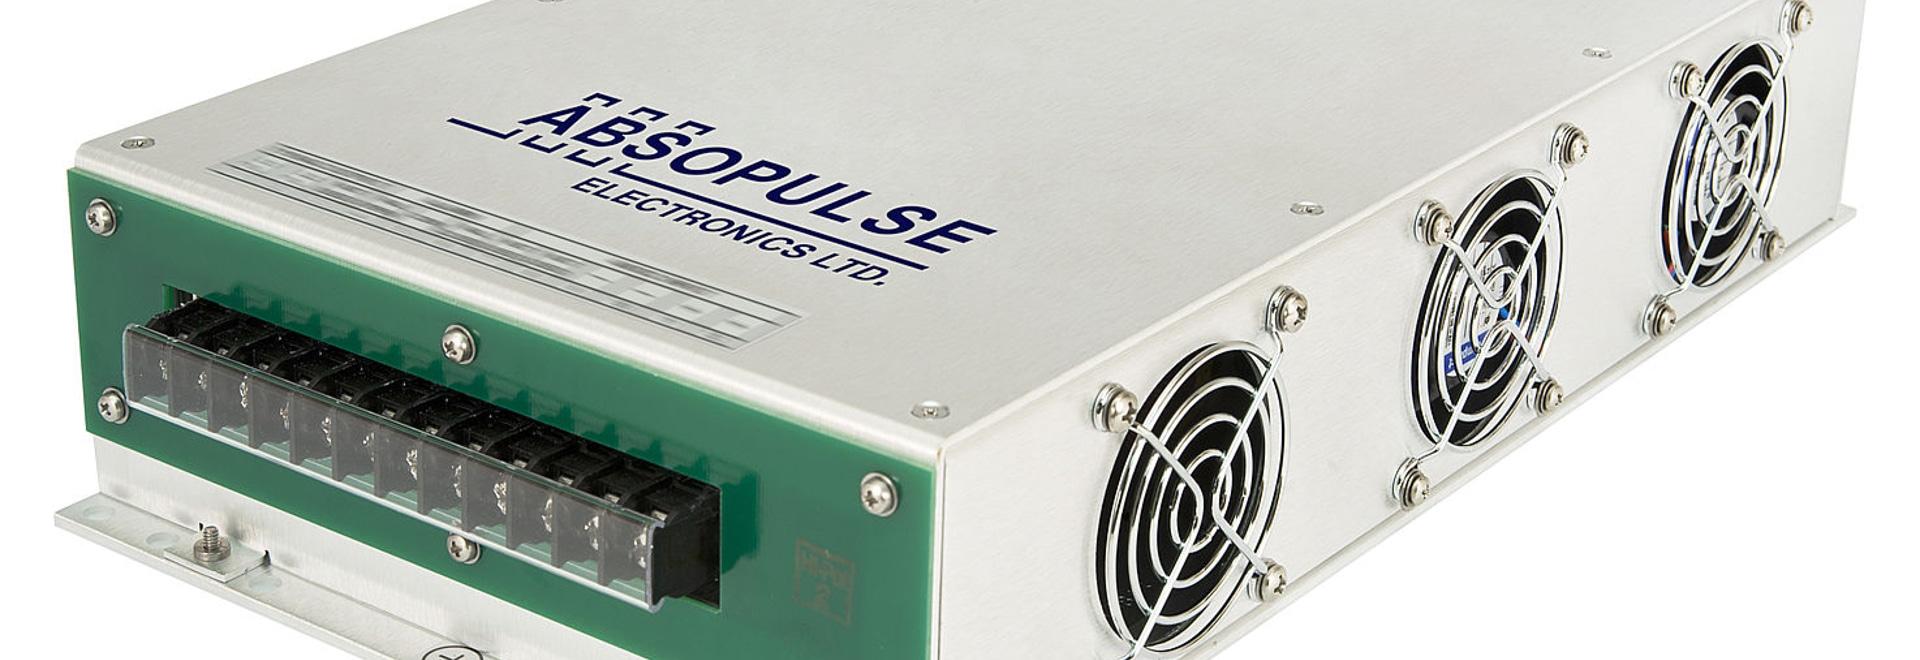 500VA Compact DC/AC inverters deliver pure sine wave output